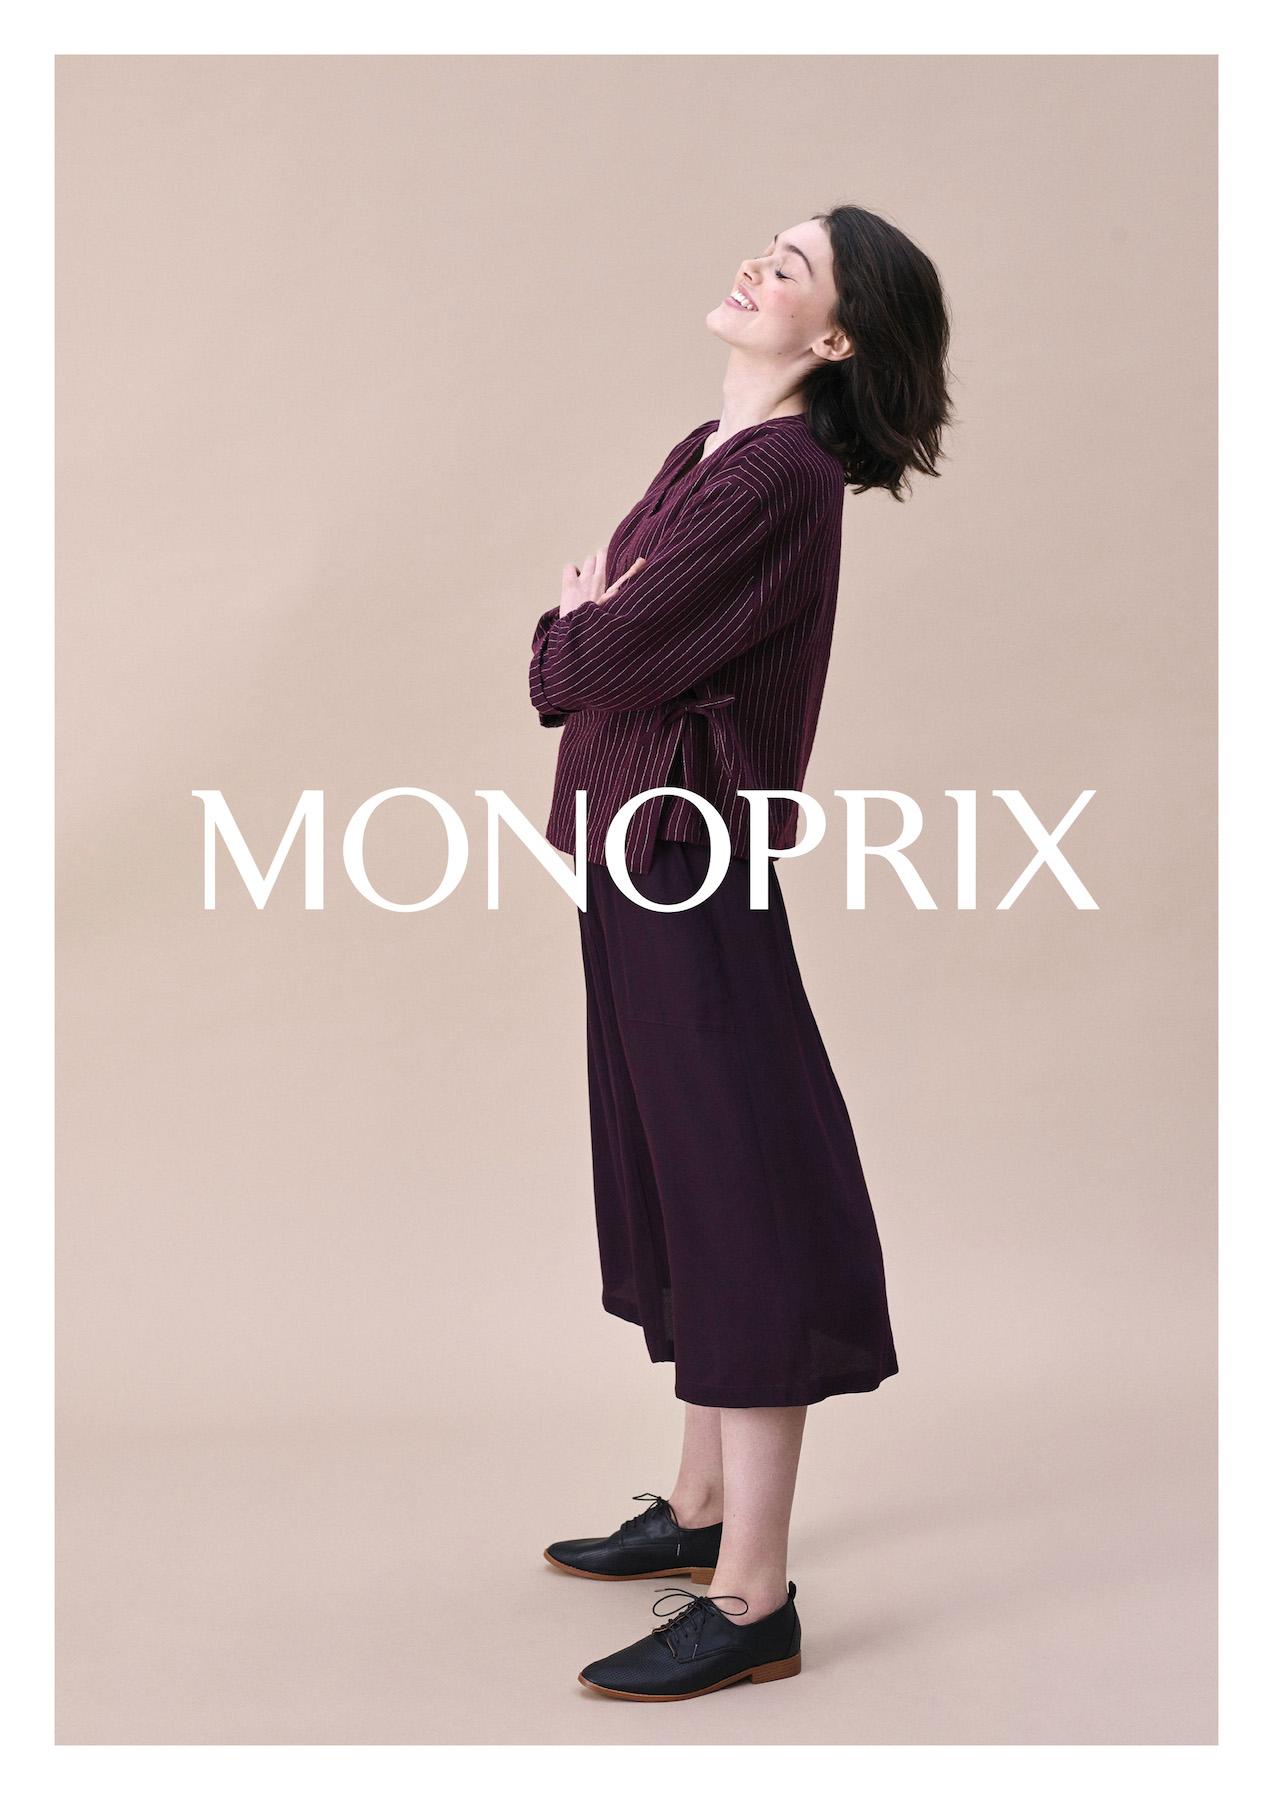 022-icon-artist-management-Kristin-Vicari-Commissions-MONOPRIX.jpg